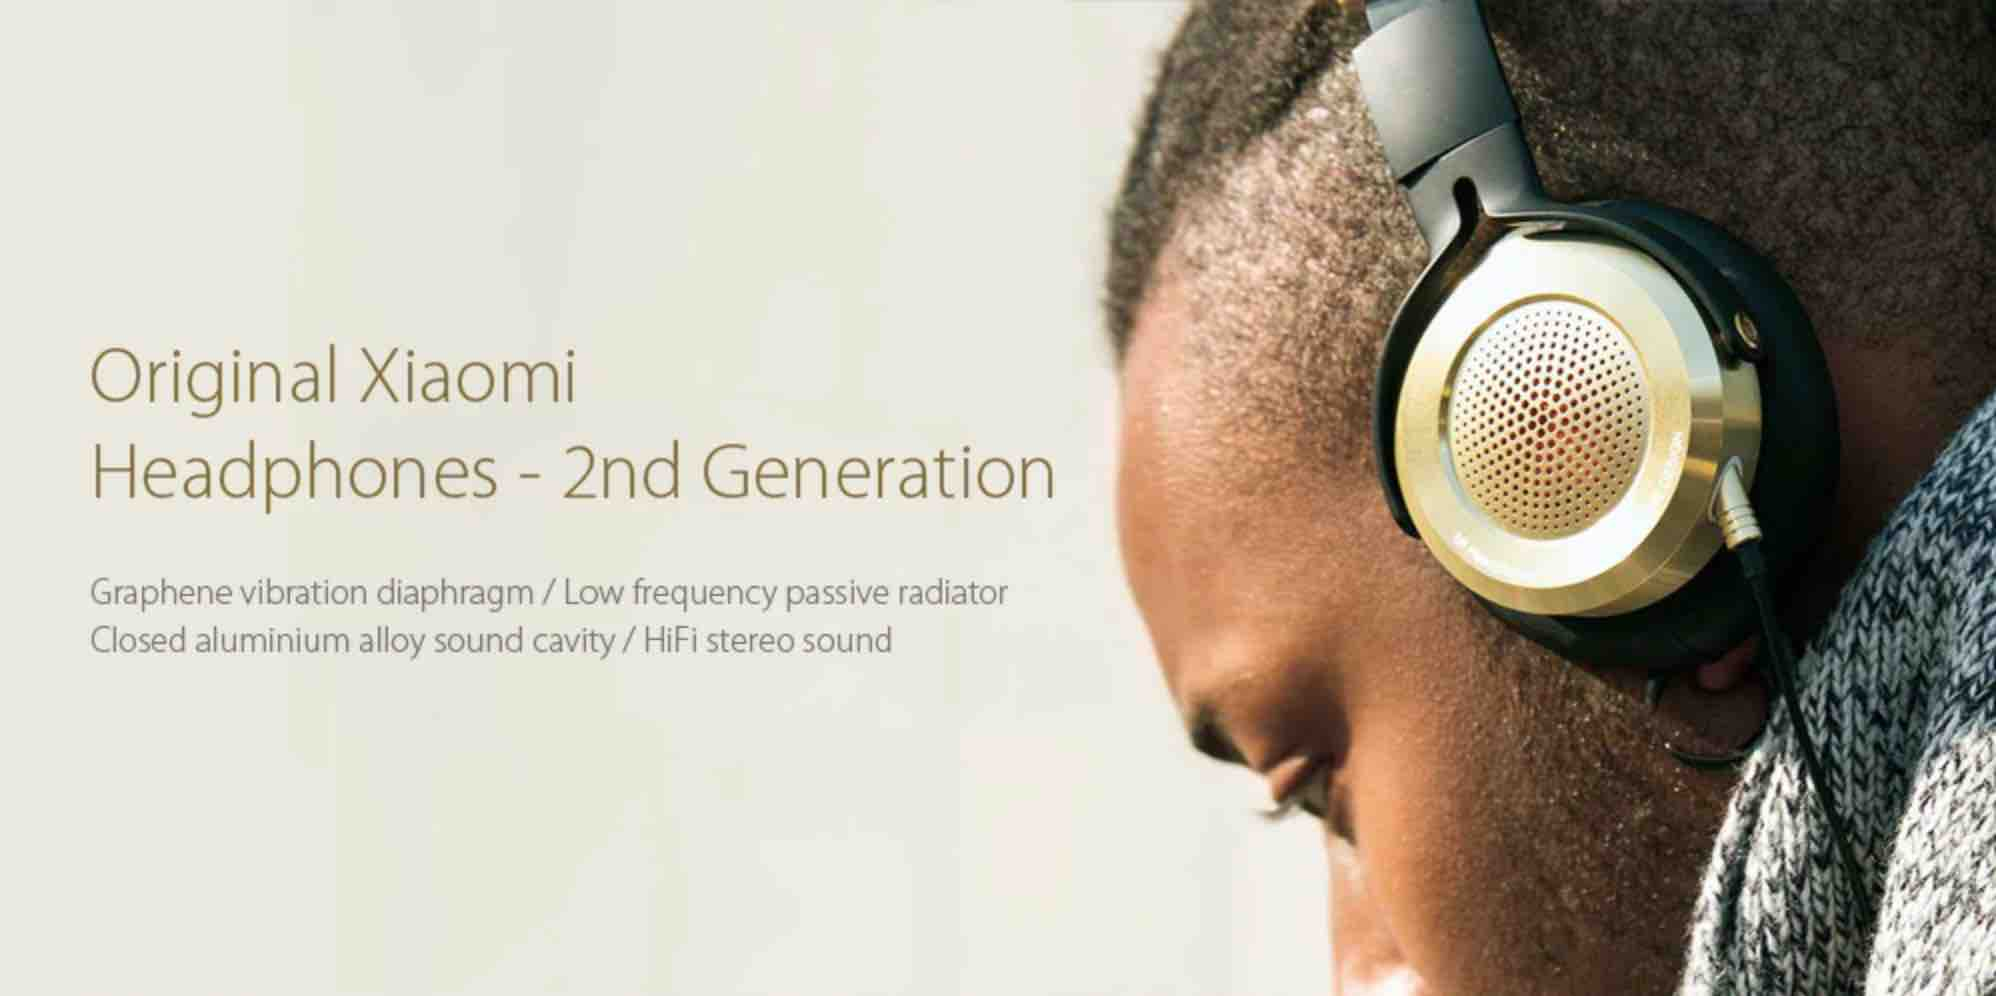 Xiaomi 2nd Generation